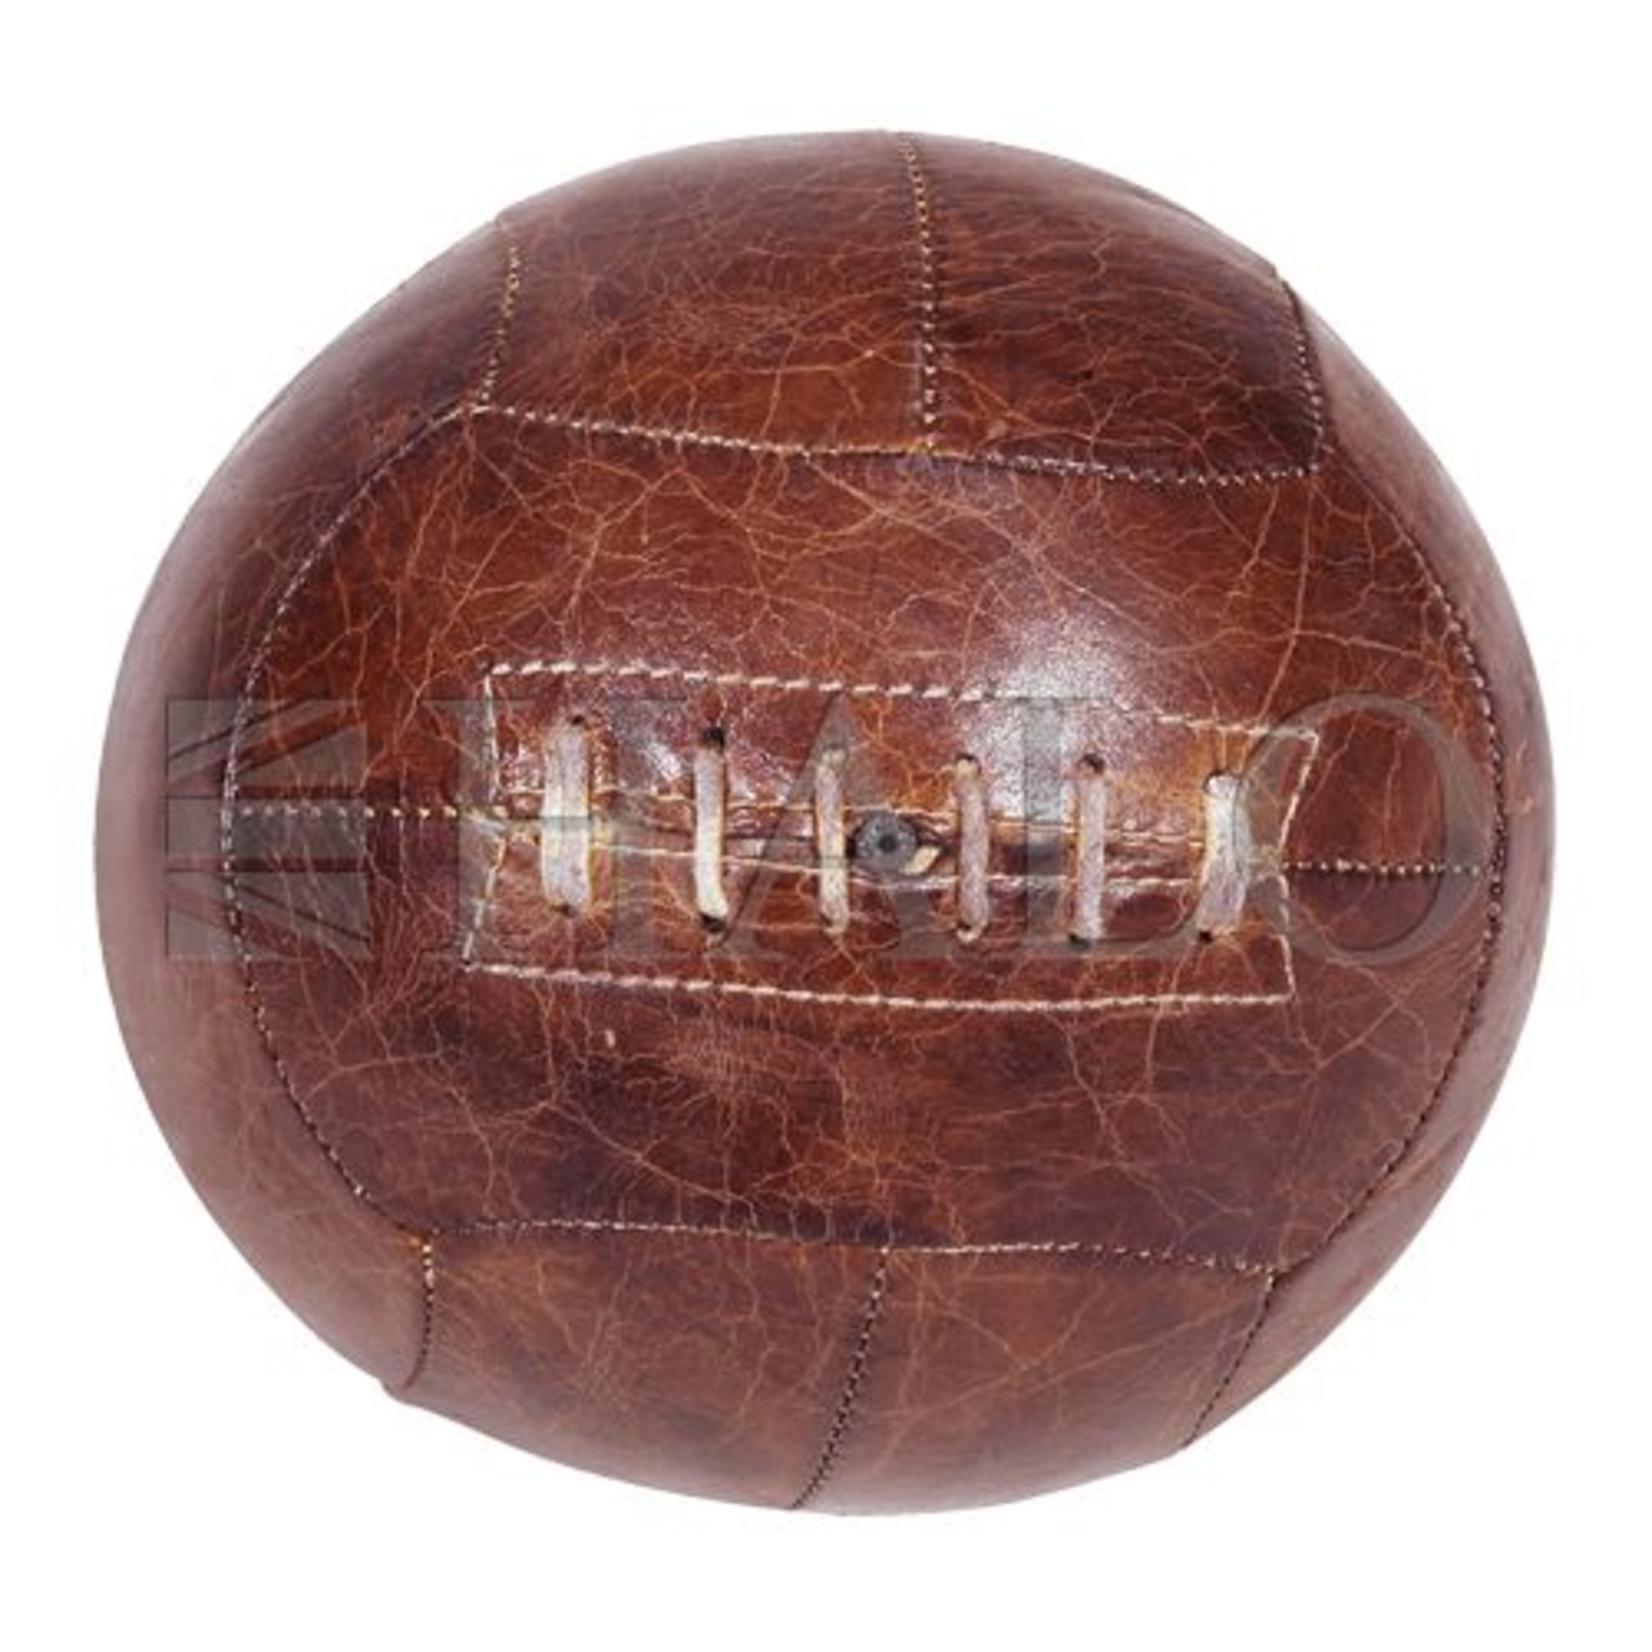 TIMOTHY OULTON FOOTBALL MINI